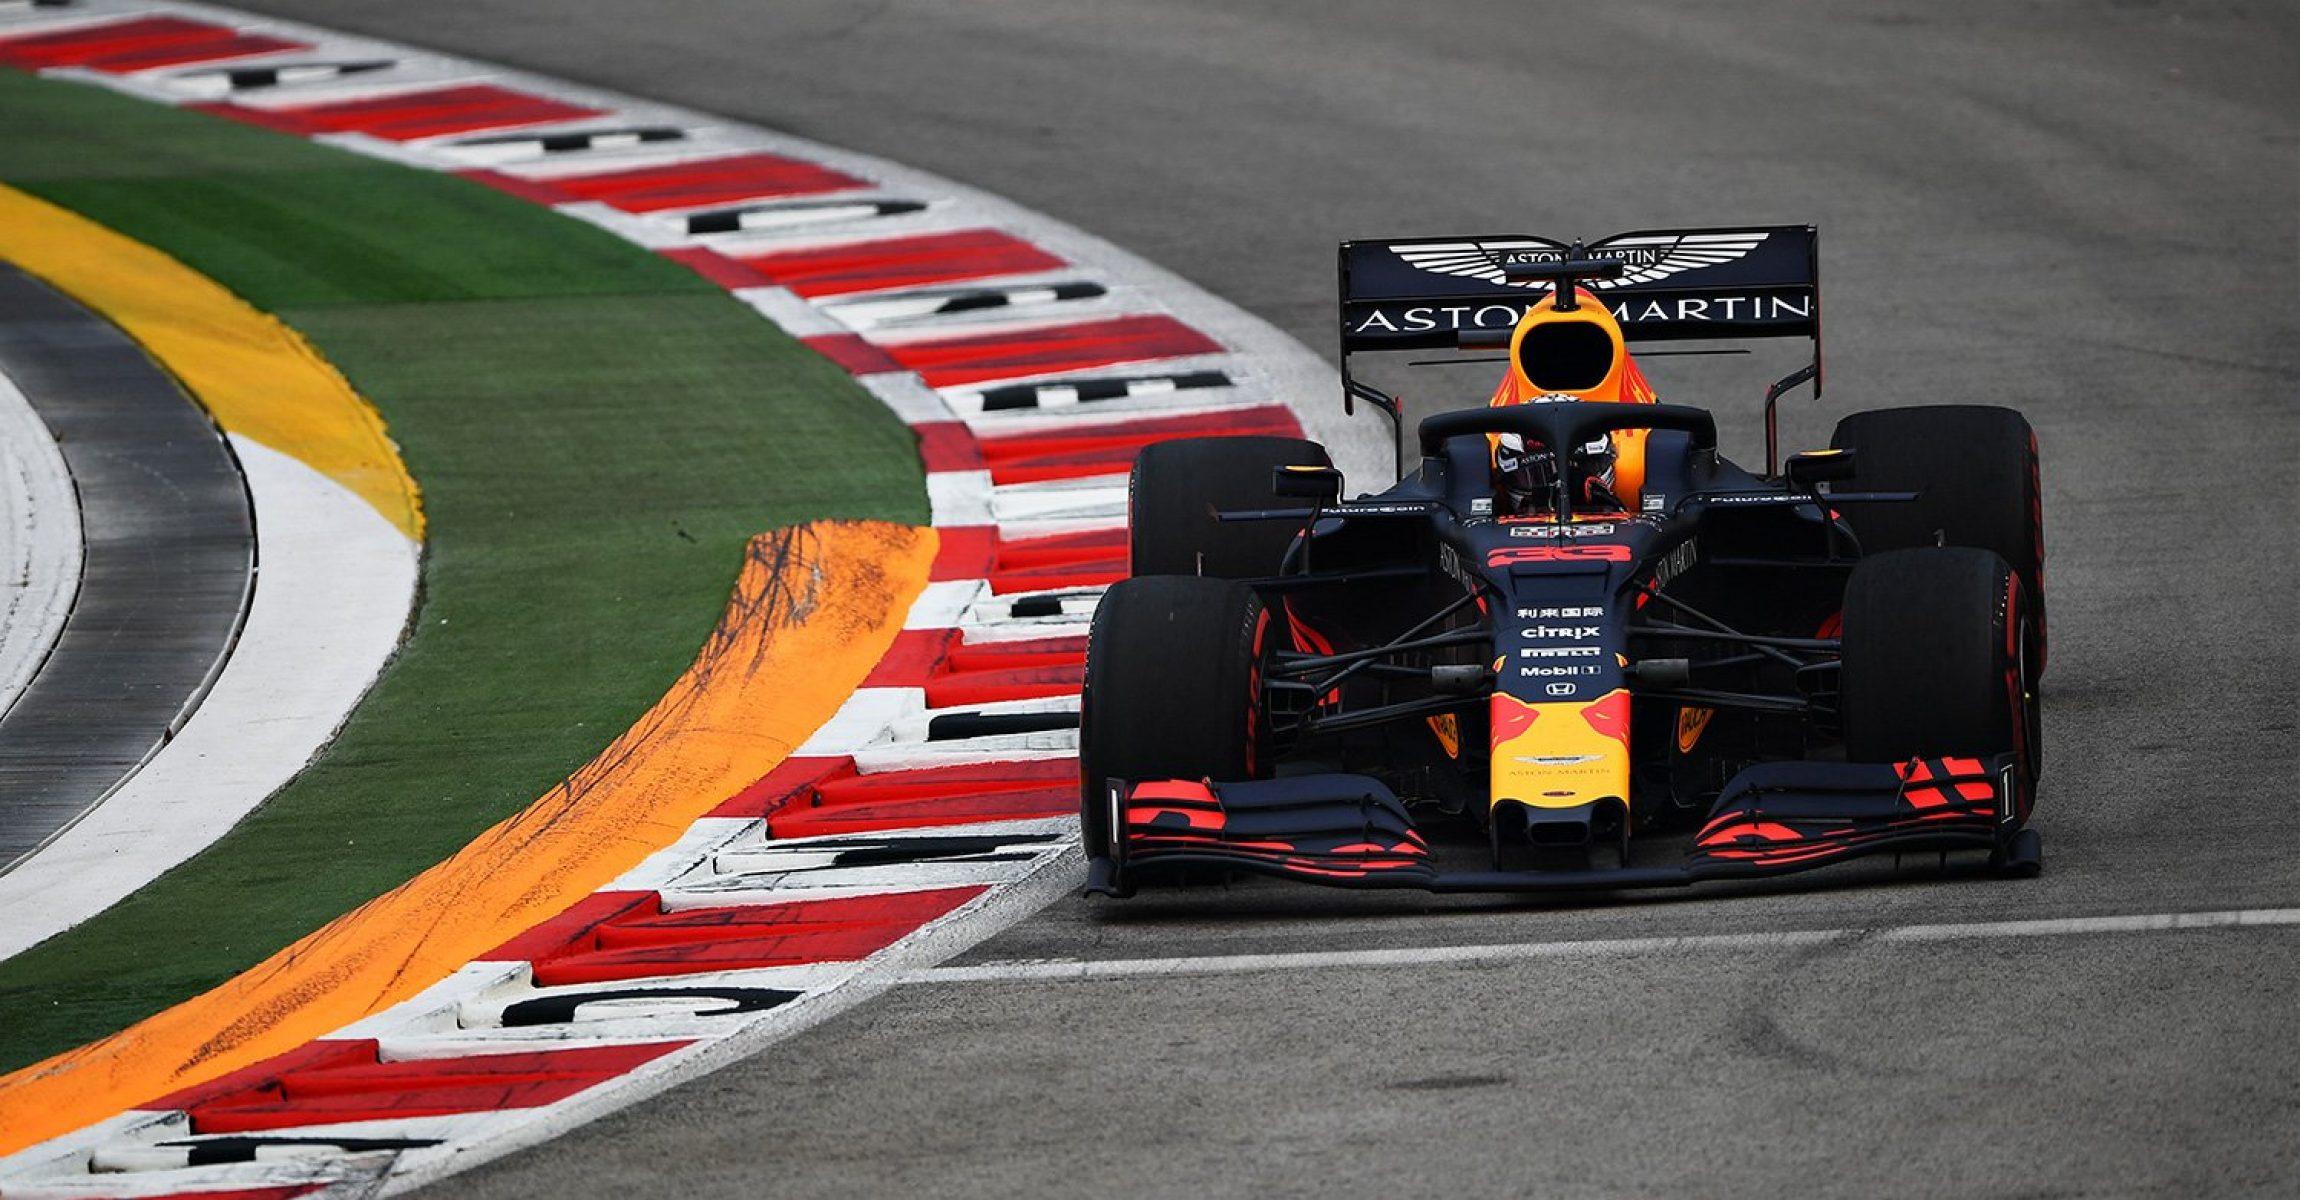 Max Verstappen, Singapore, Red Bull Racing, FP1